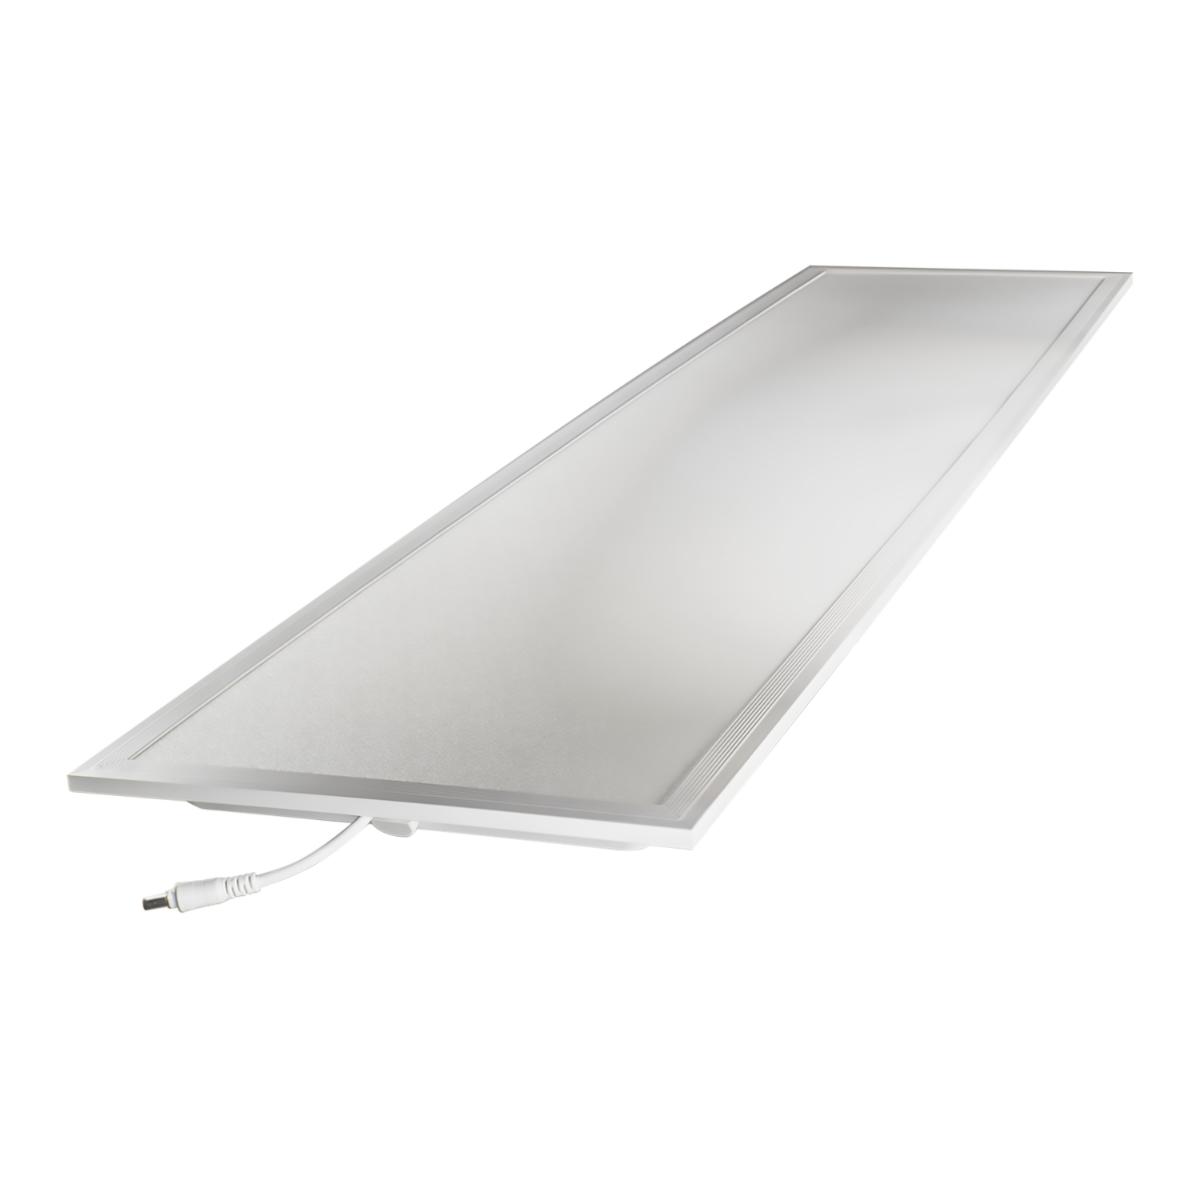 Noxion LED Panel Econox 32W 30x120cm 3000K 3900lm UGR <22 | Replacer for 2x36W